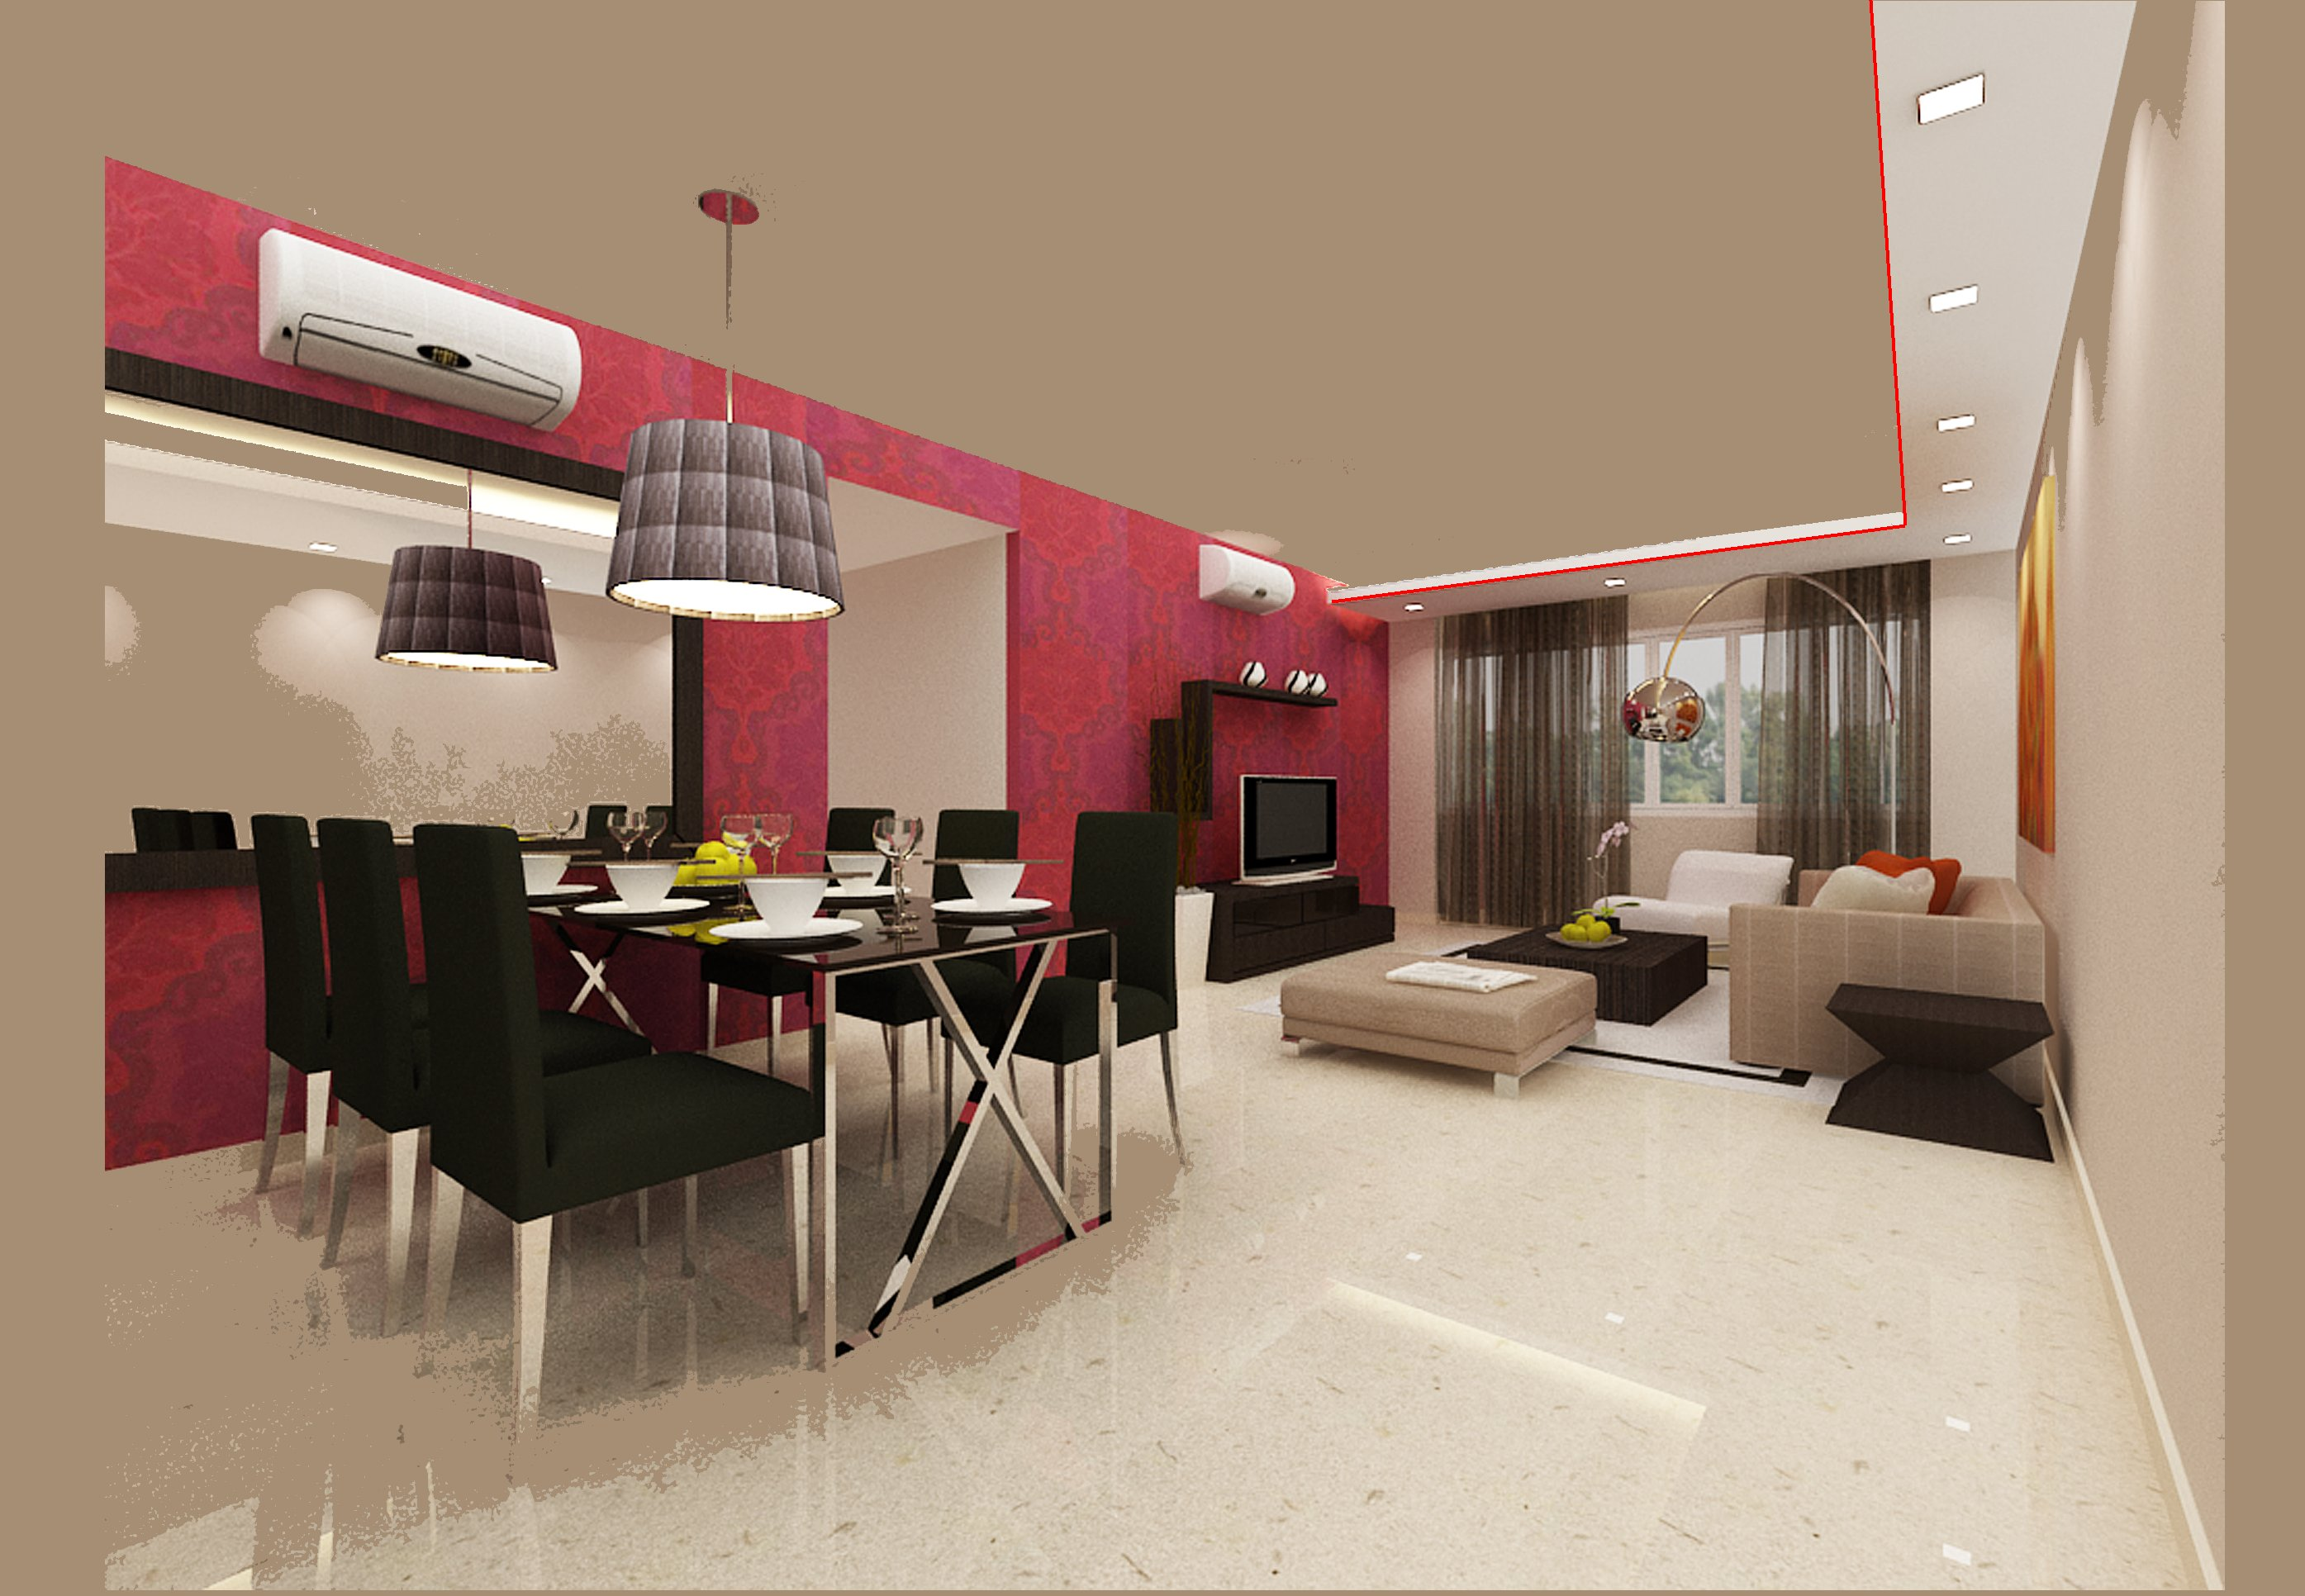 Designs Of False Ceilings In The Living Room Feng Shui